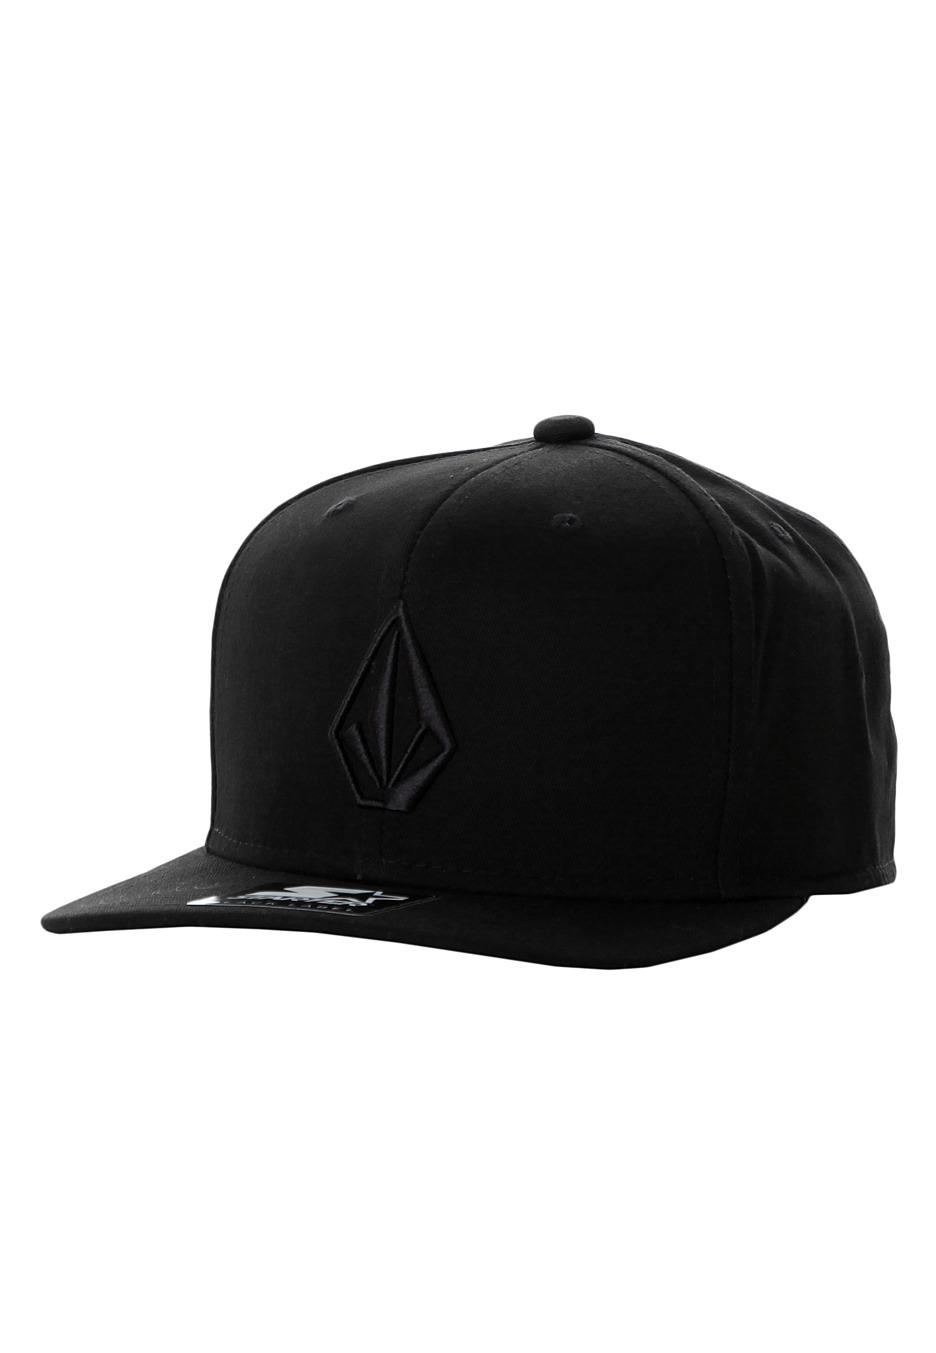 Volcom - Full Stone X Starter Tinted Black Snapback - Cap - Streetwear Shop  - Impericon.com UK 0f2ae37ee0e